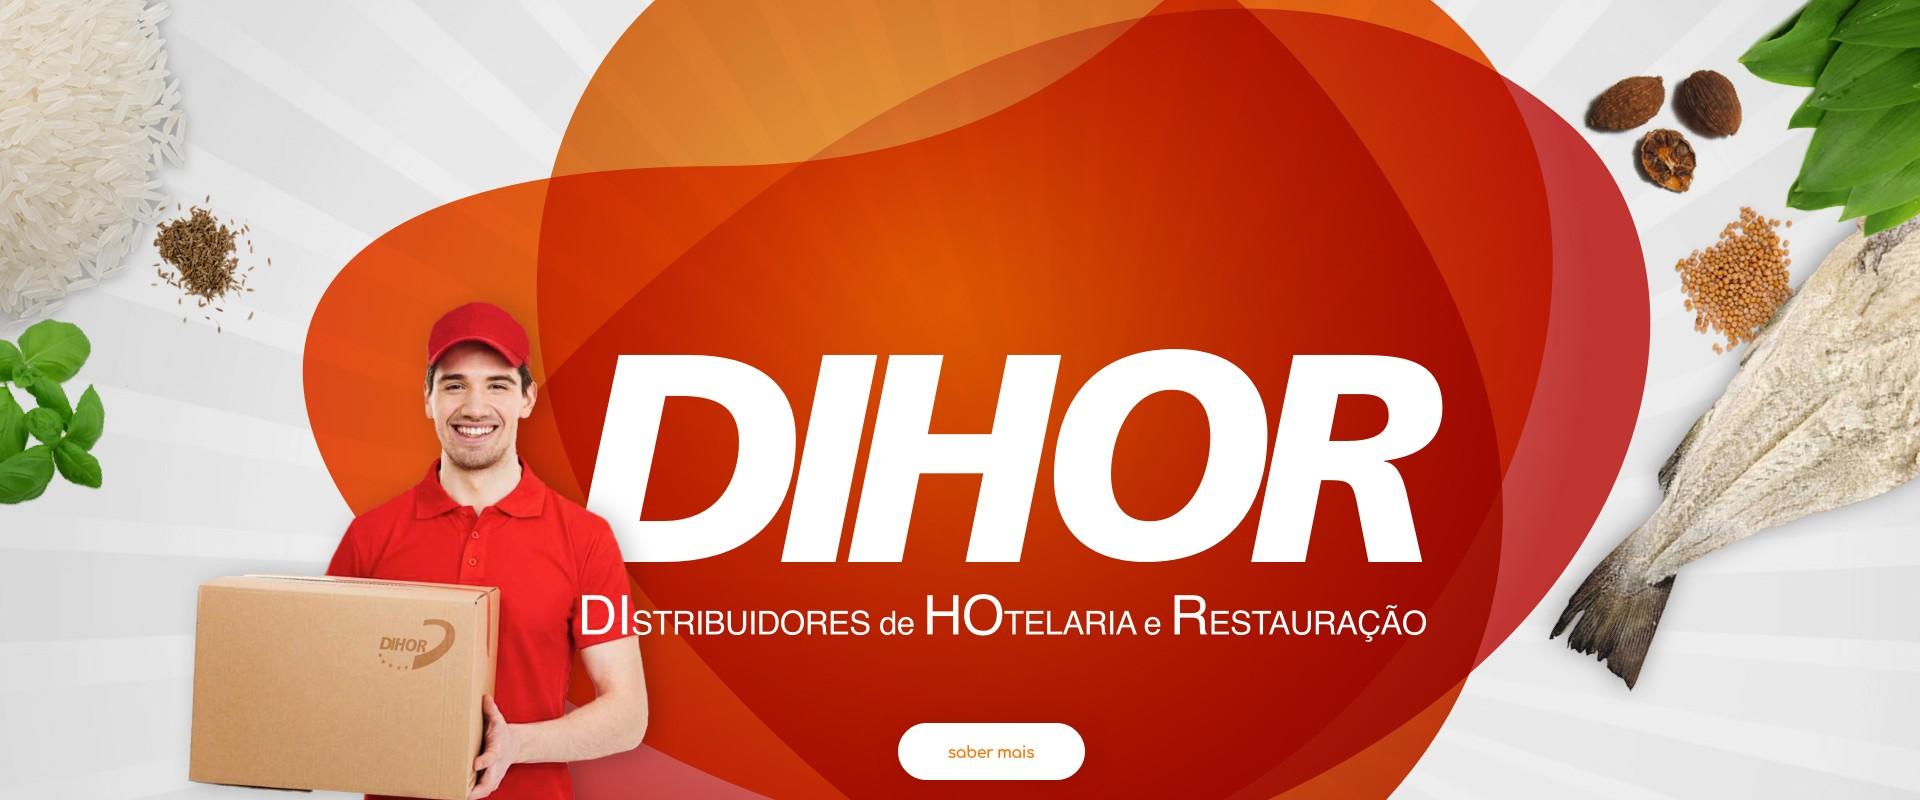 Dihor